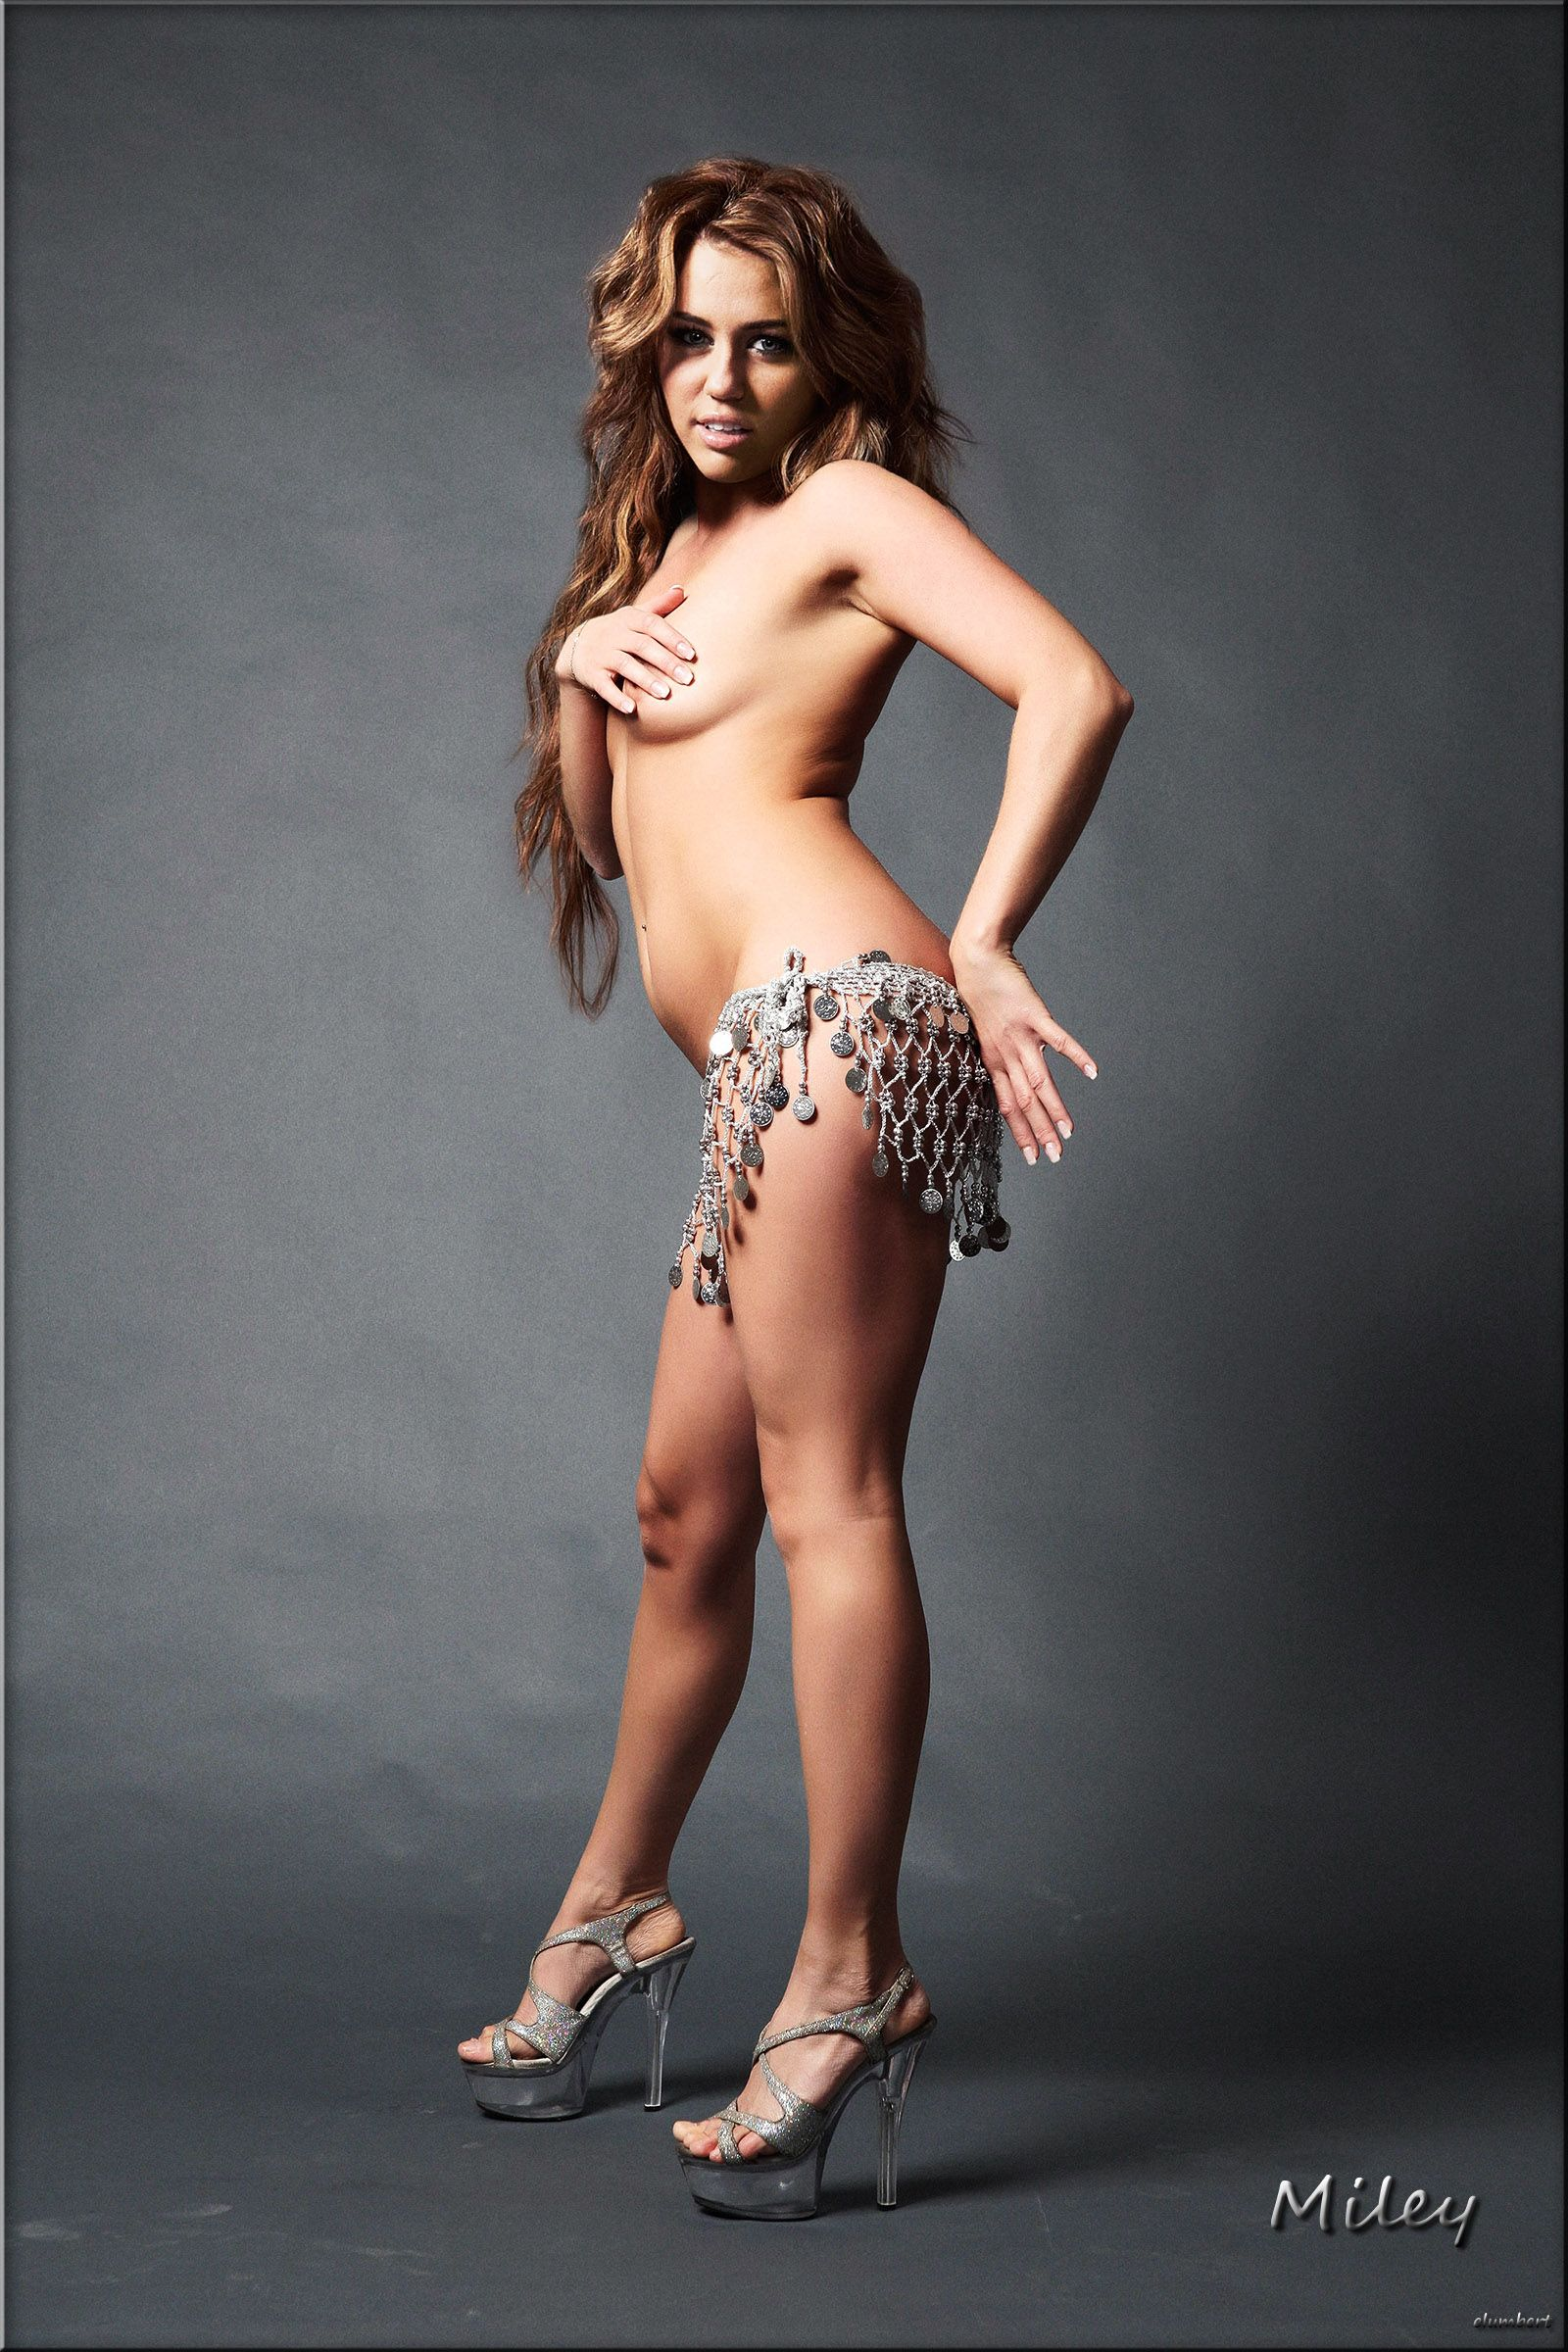 Topless Bellydancer Miley Cyrus